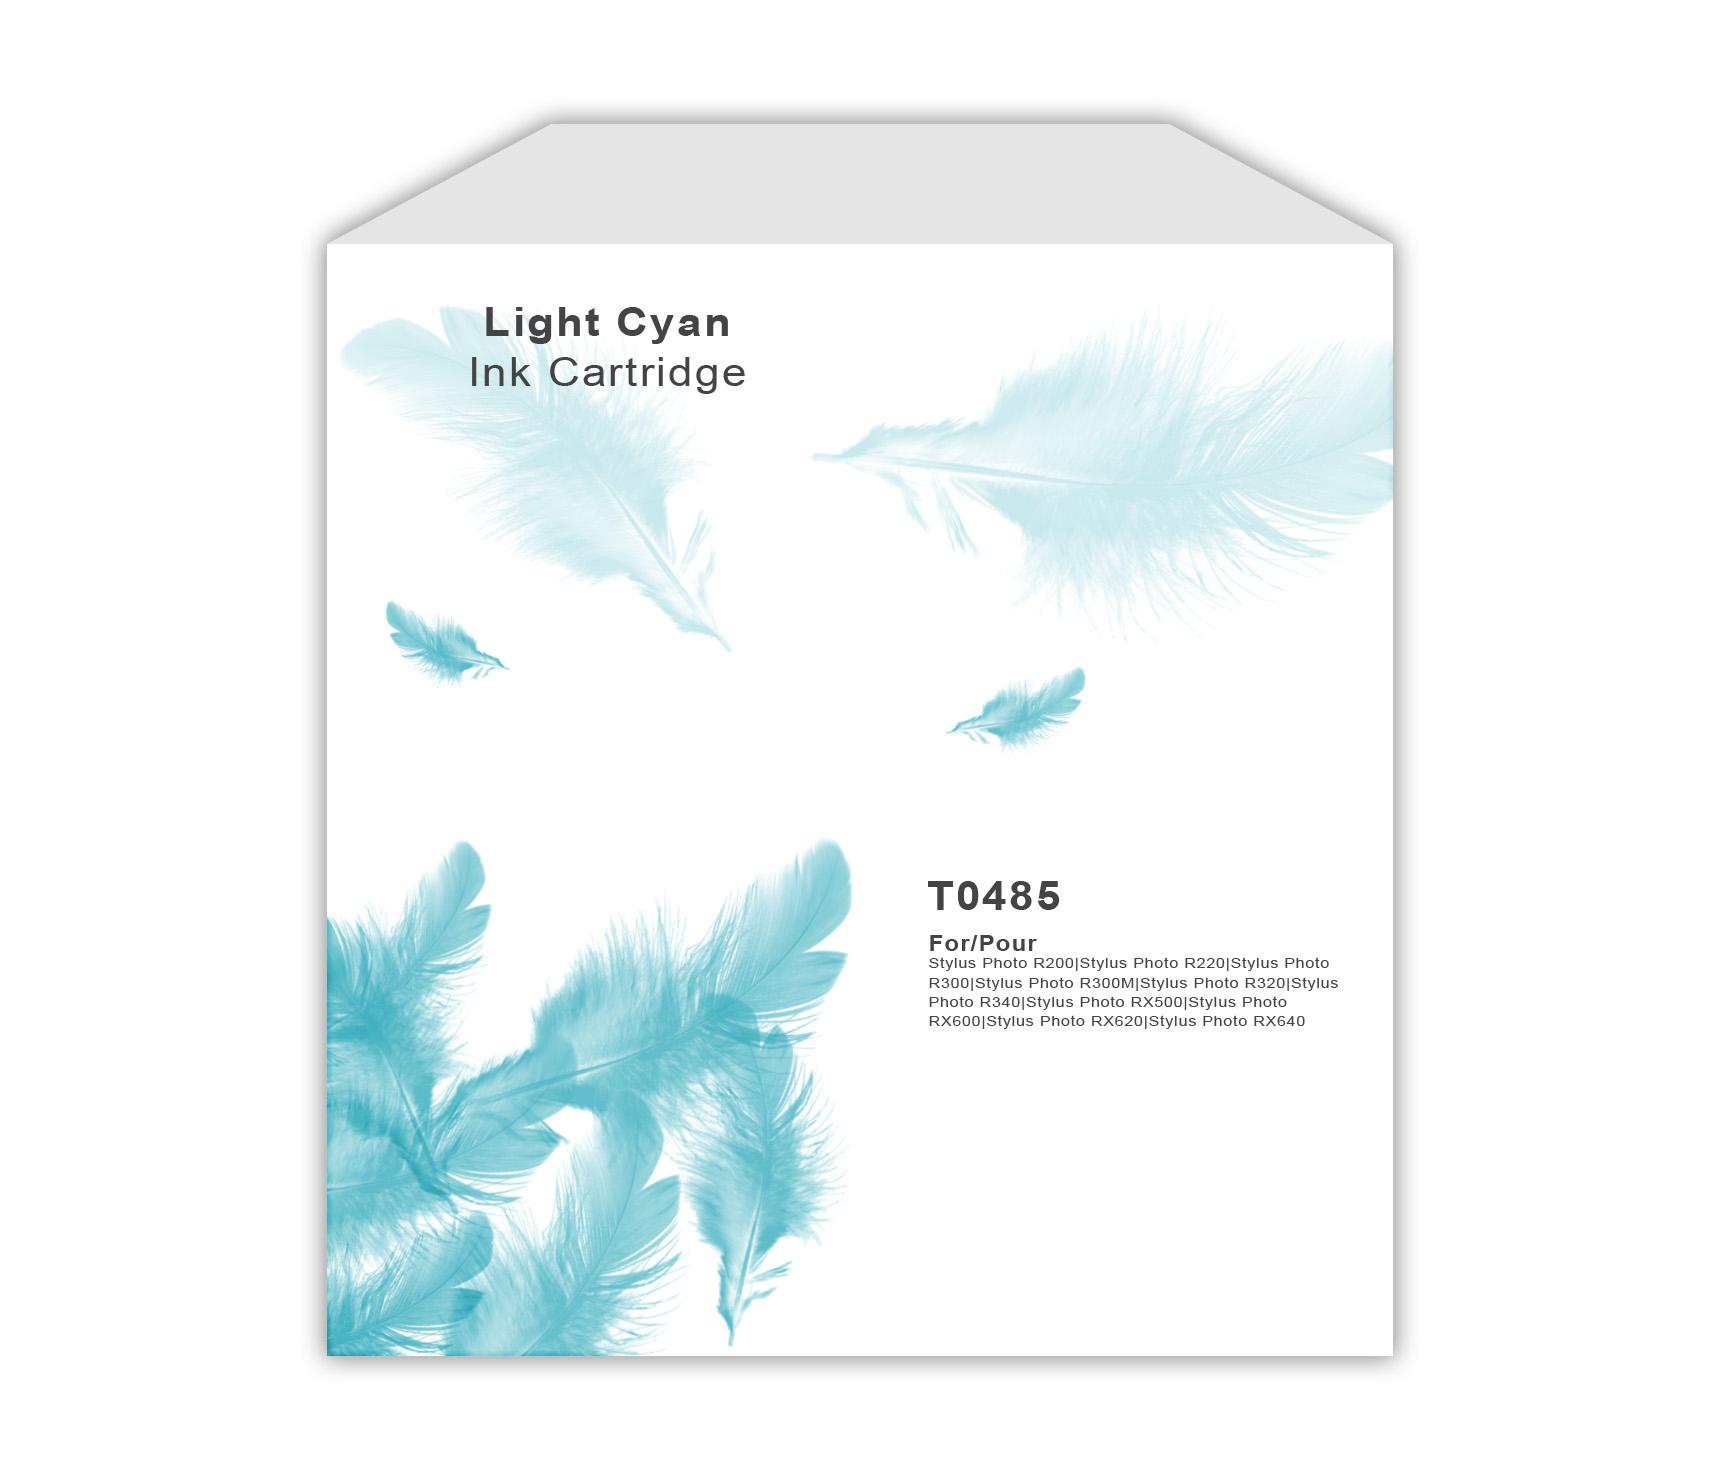 Epson TO485 Light Cyan Ink Cartridge